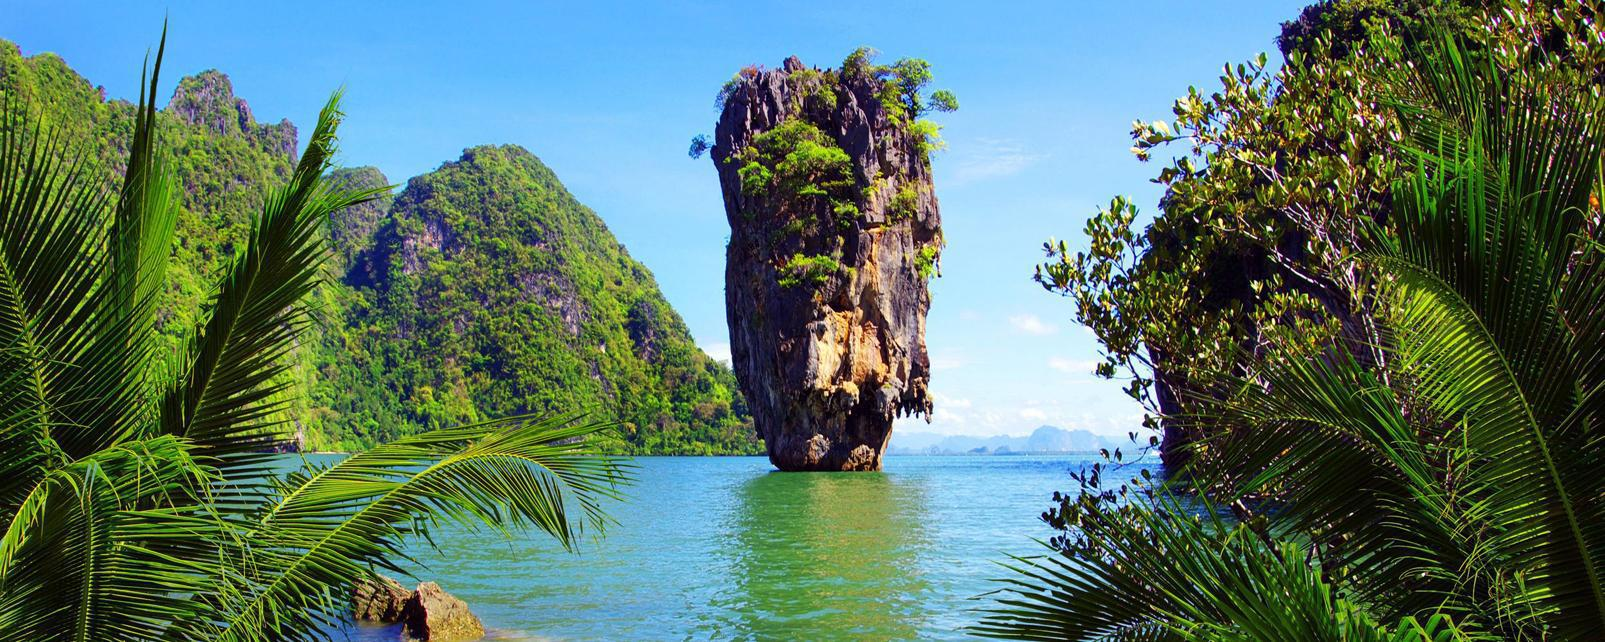 Thaïlande.jpg